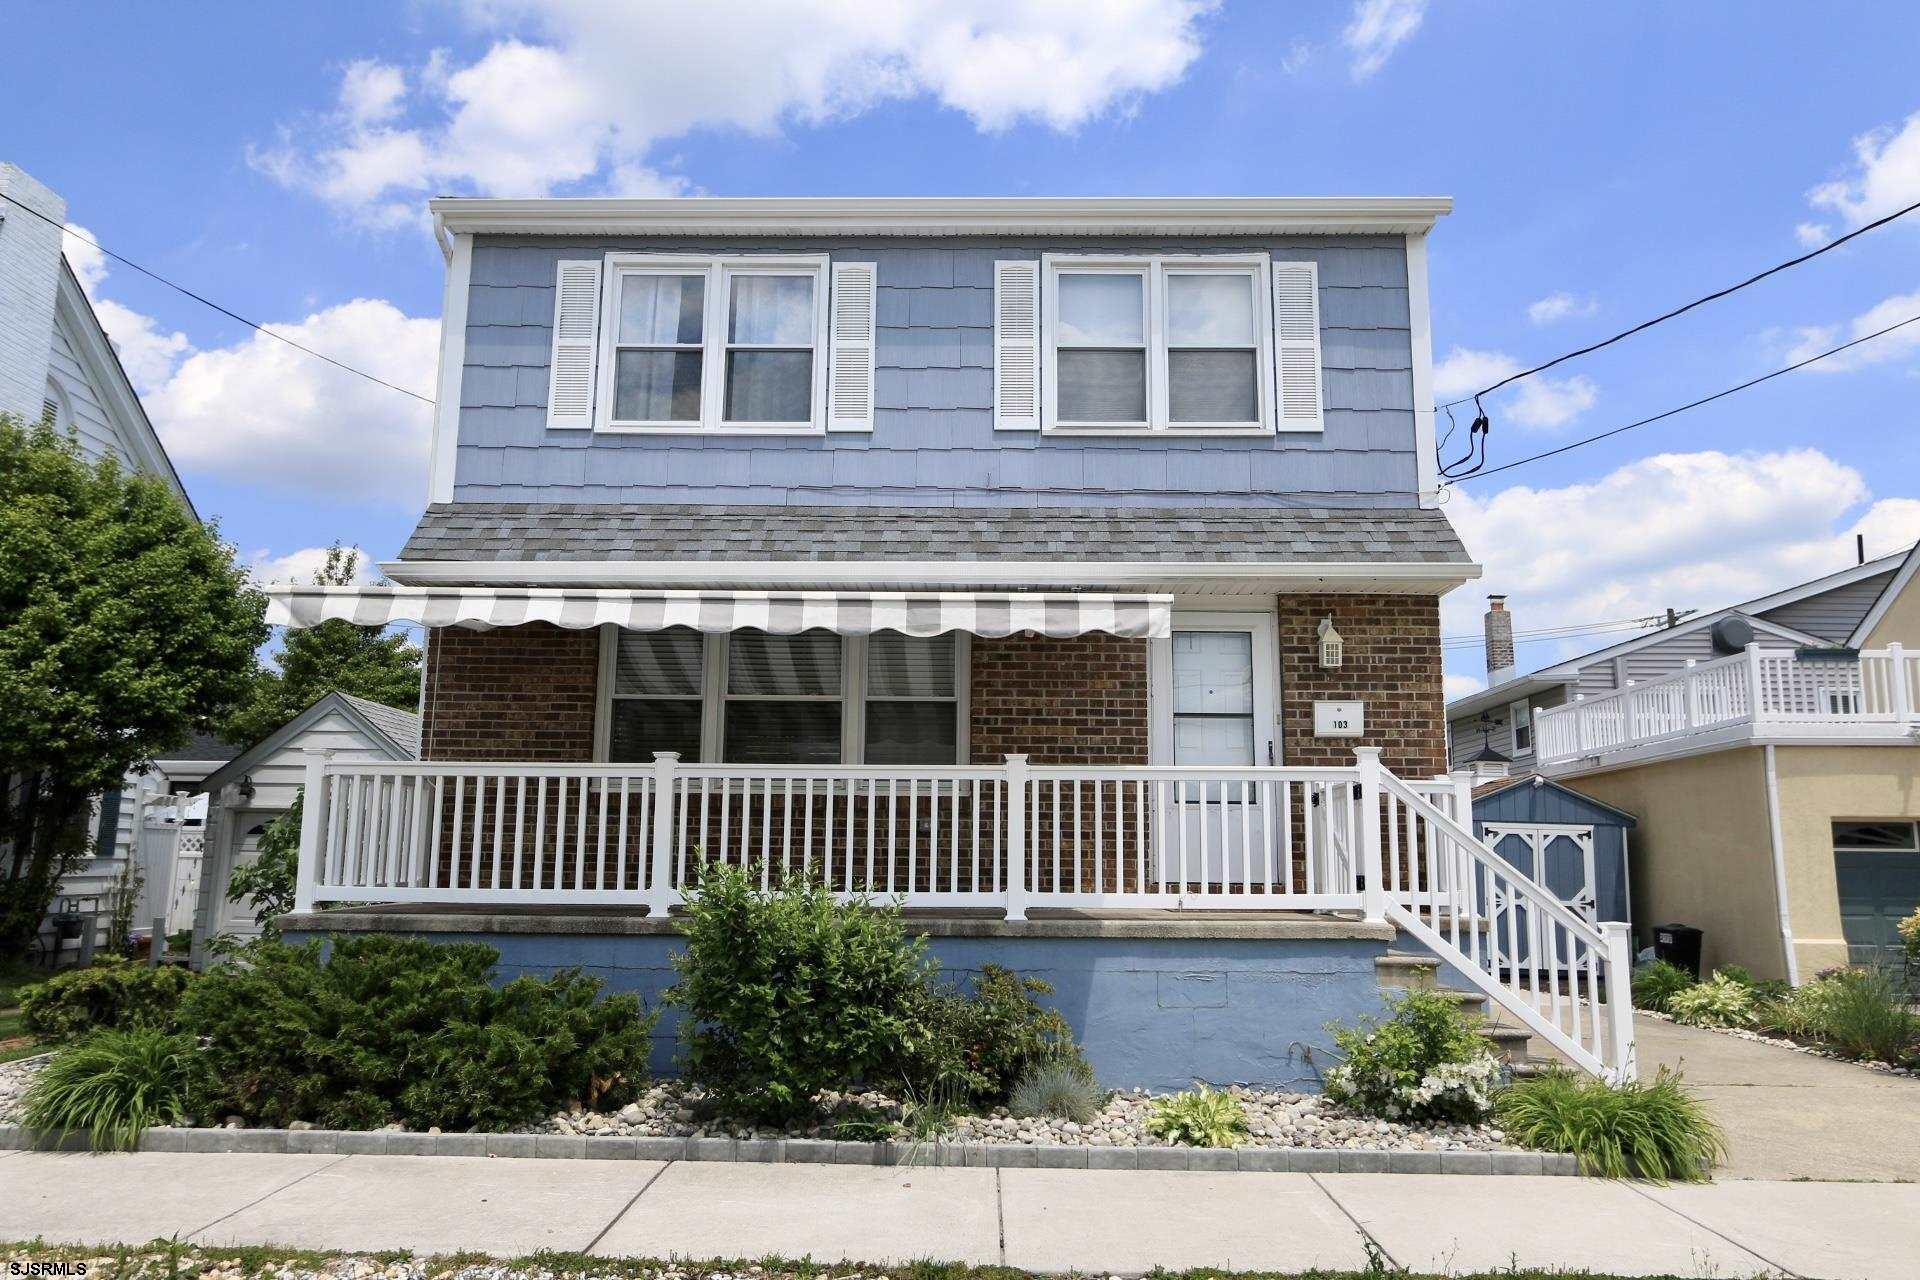 103 N Belmont Ave, Margate, NJ 08402